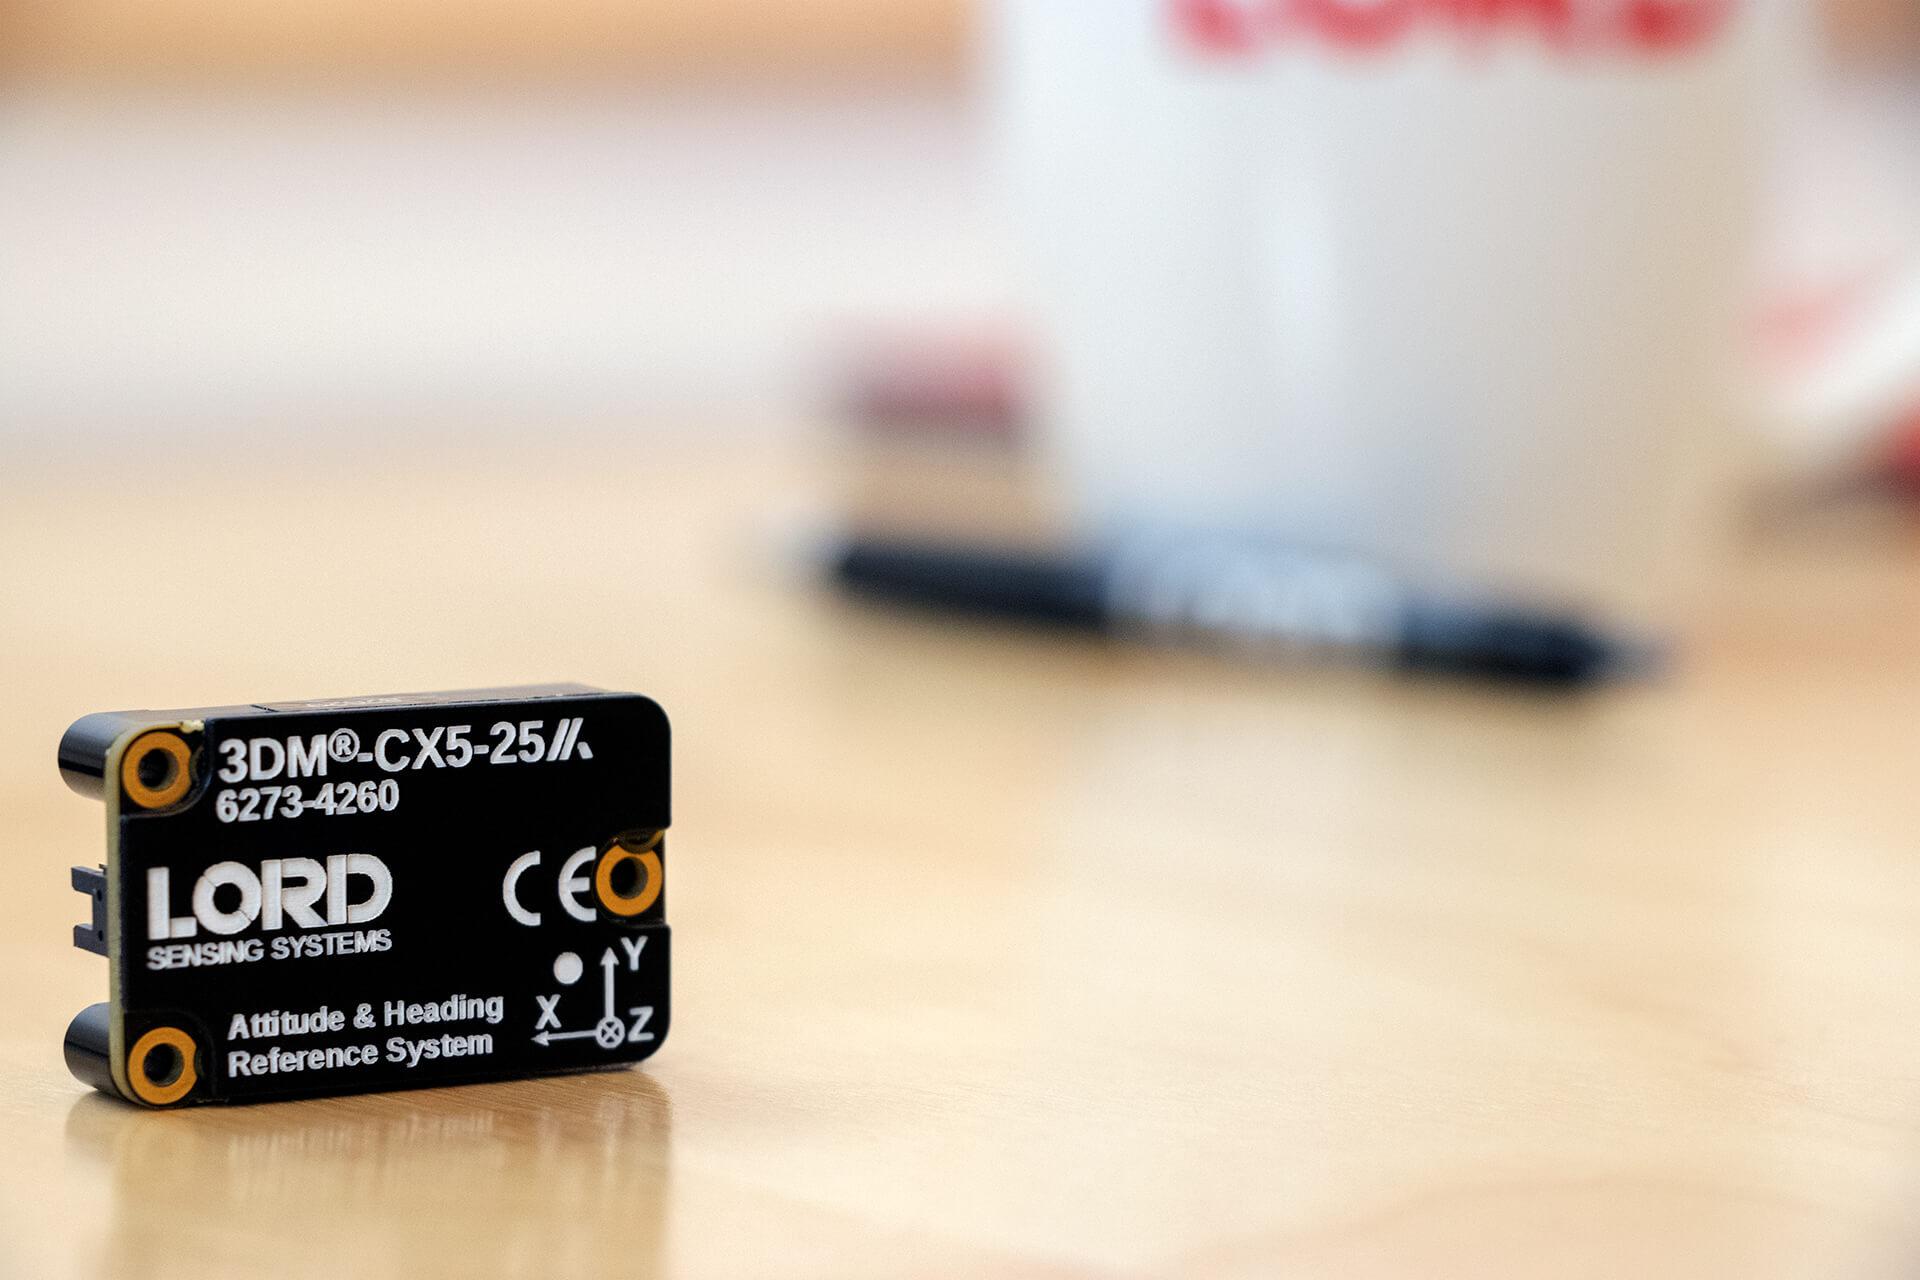 3DM-CX5-25 - 38.0 mm x 24.0 mm x 9.7 mm